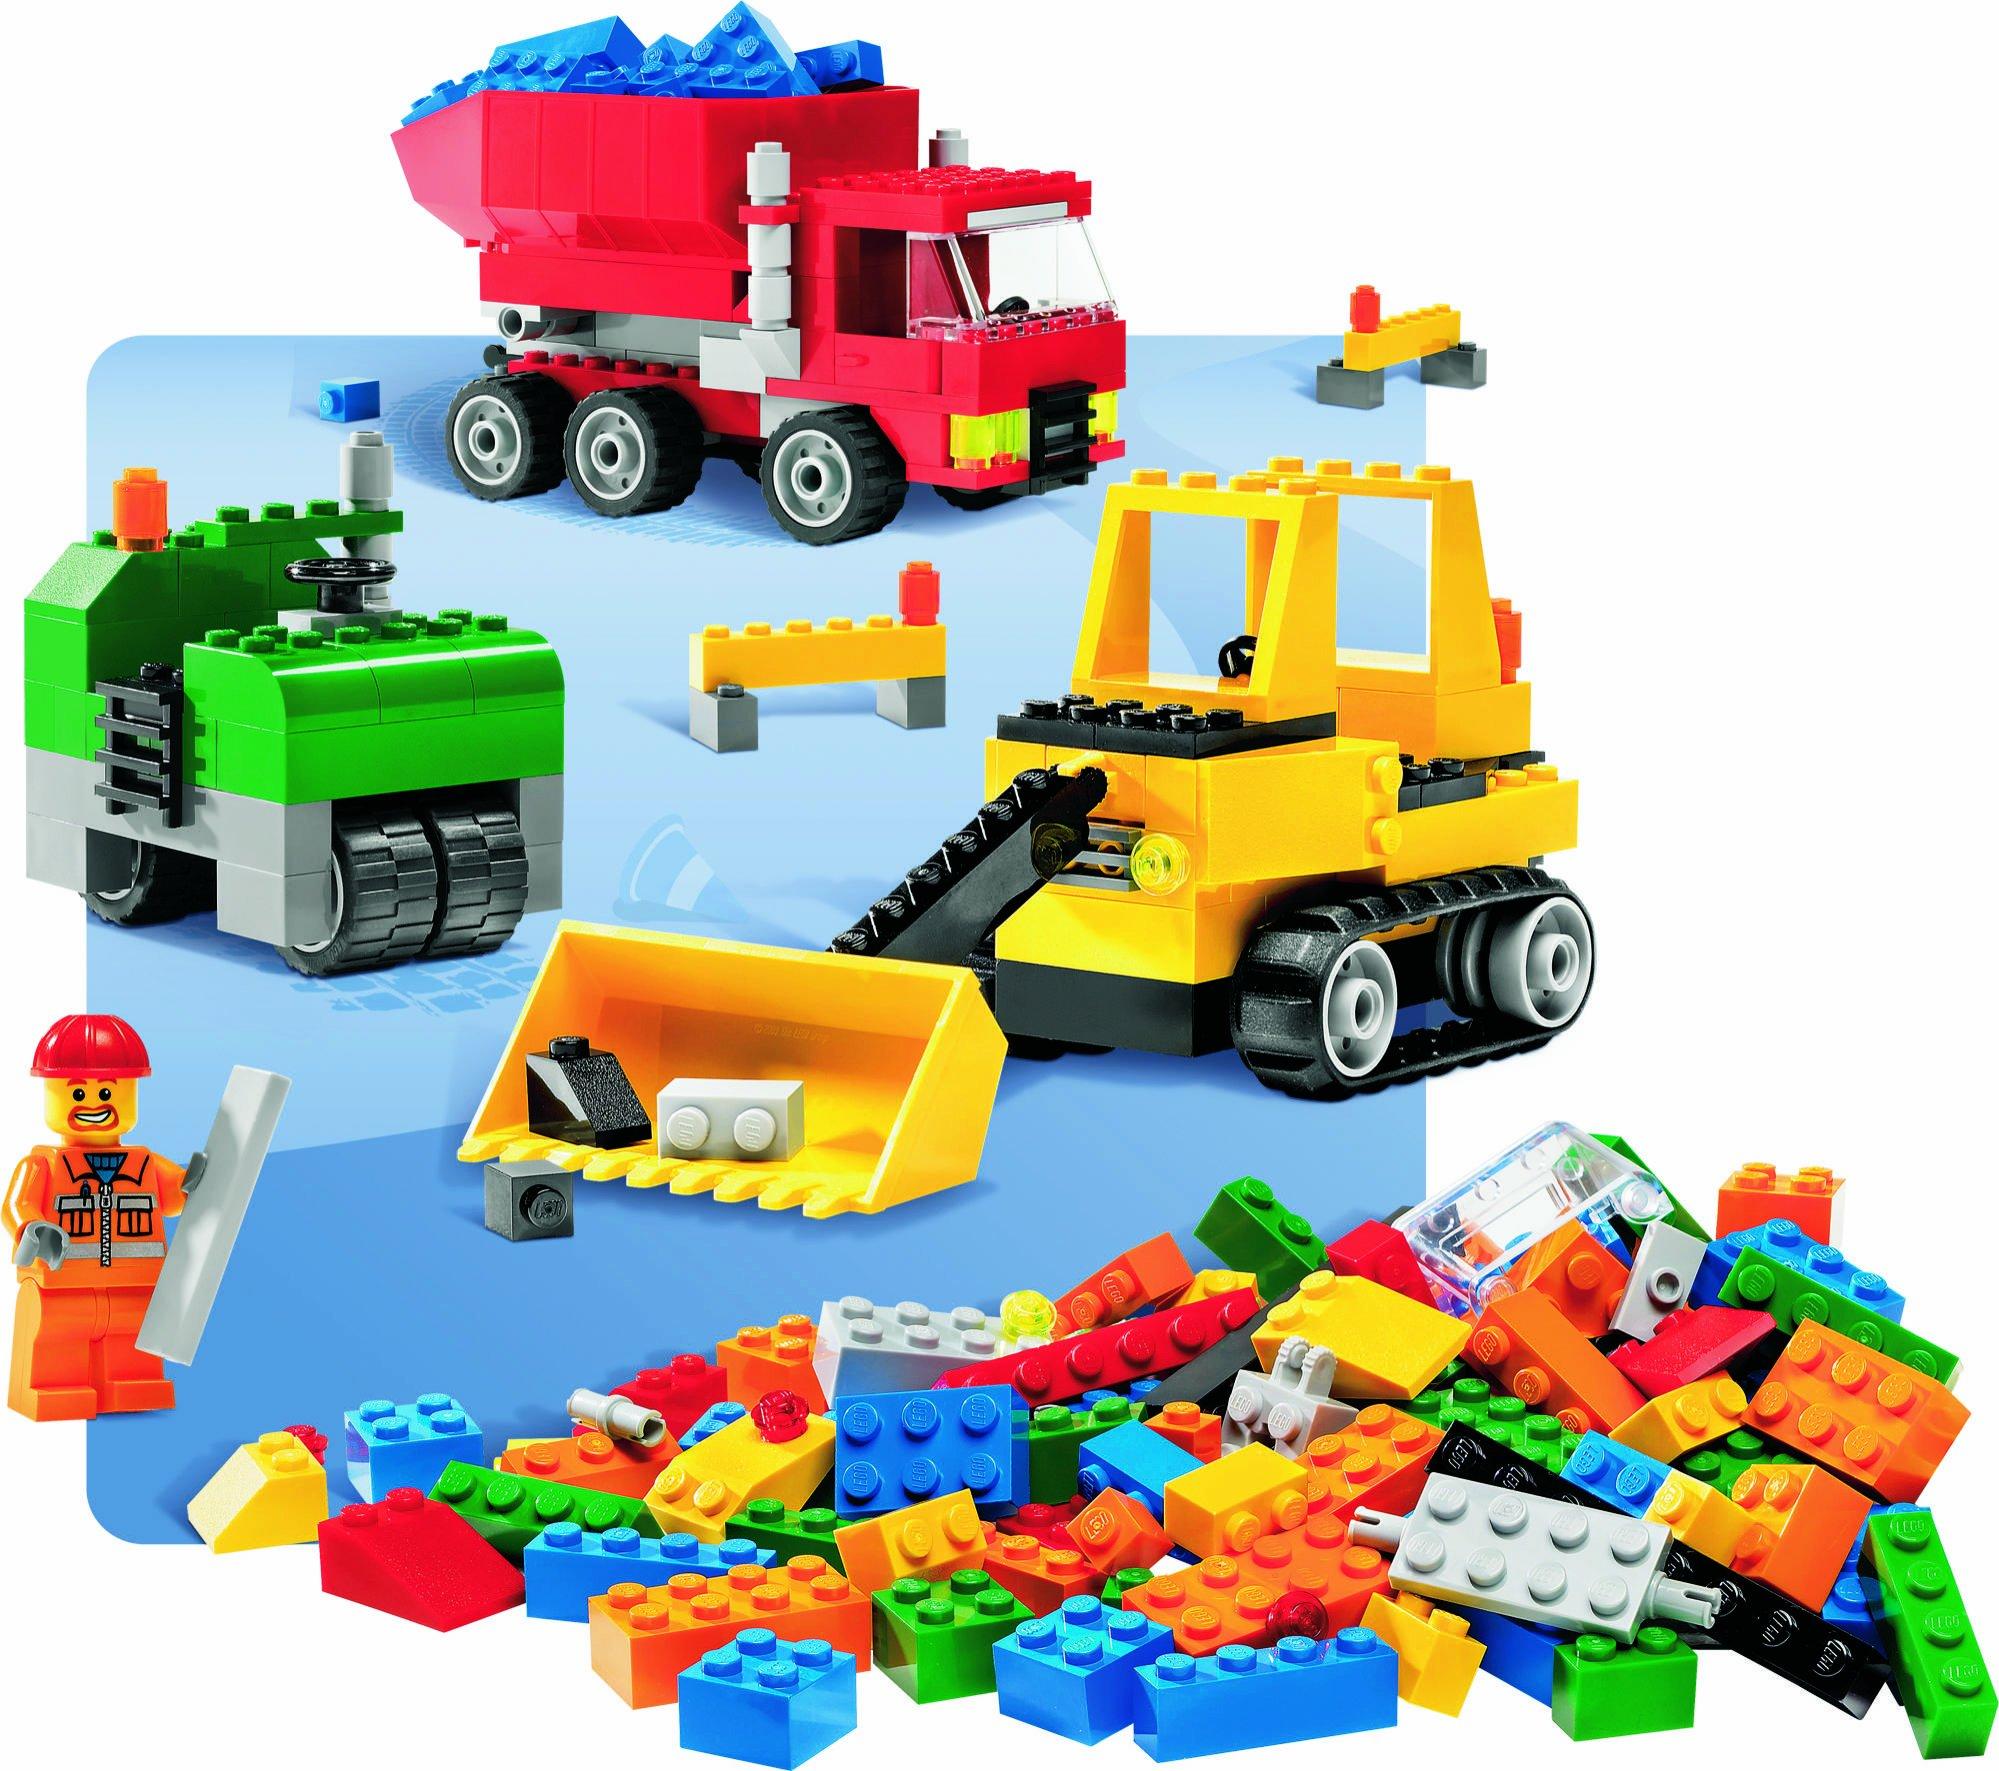 Baukästen & Konstruktion LEGO CREATOR ROAD CONSTRUCTION SET 6187 LEGO Baukästen & Sets